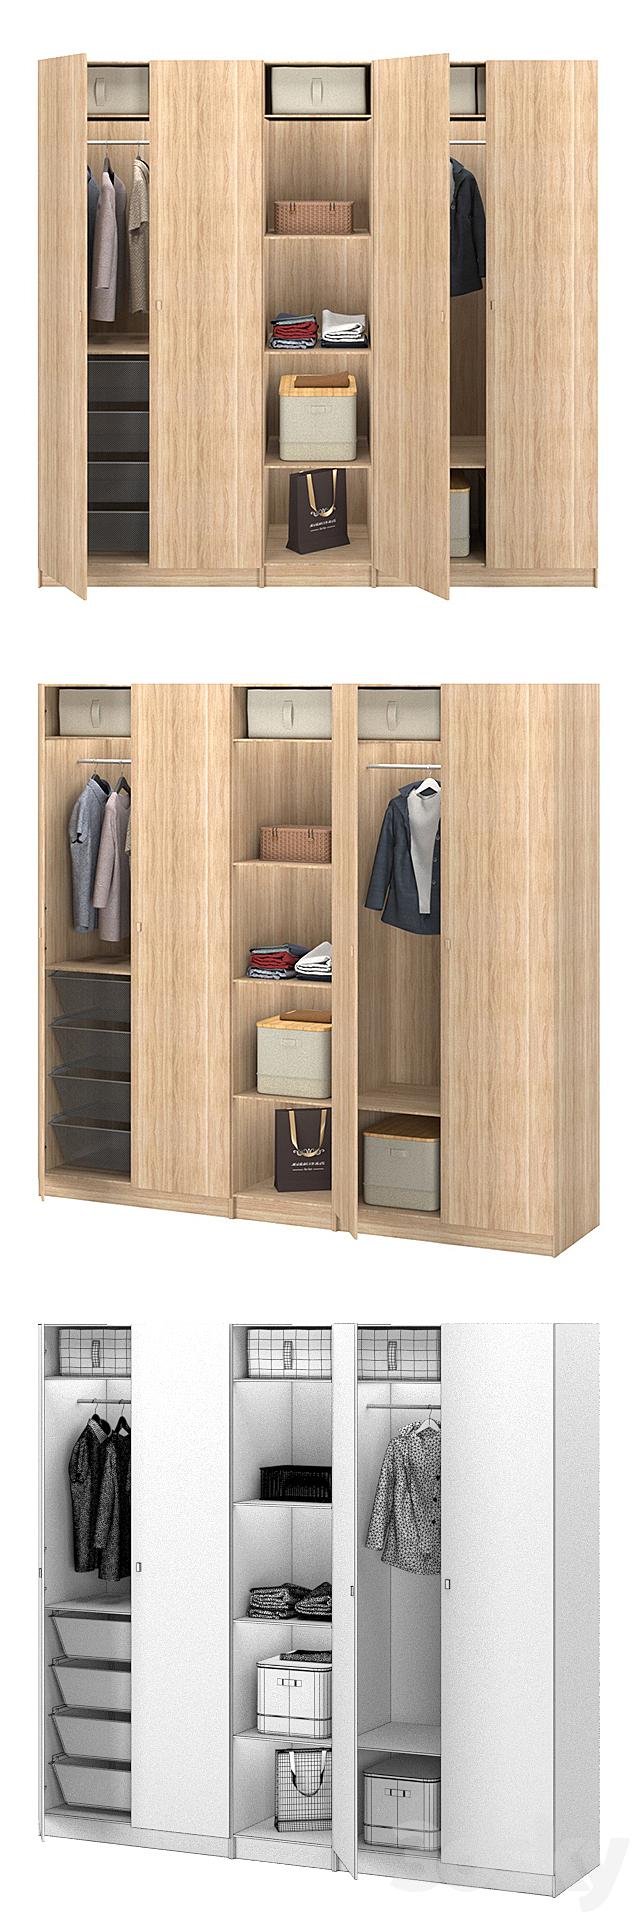 Wardrobe_Paks_IKEA_forsan